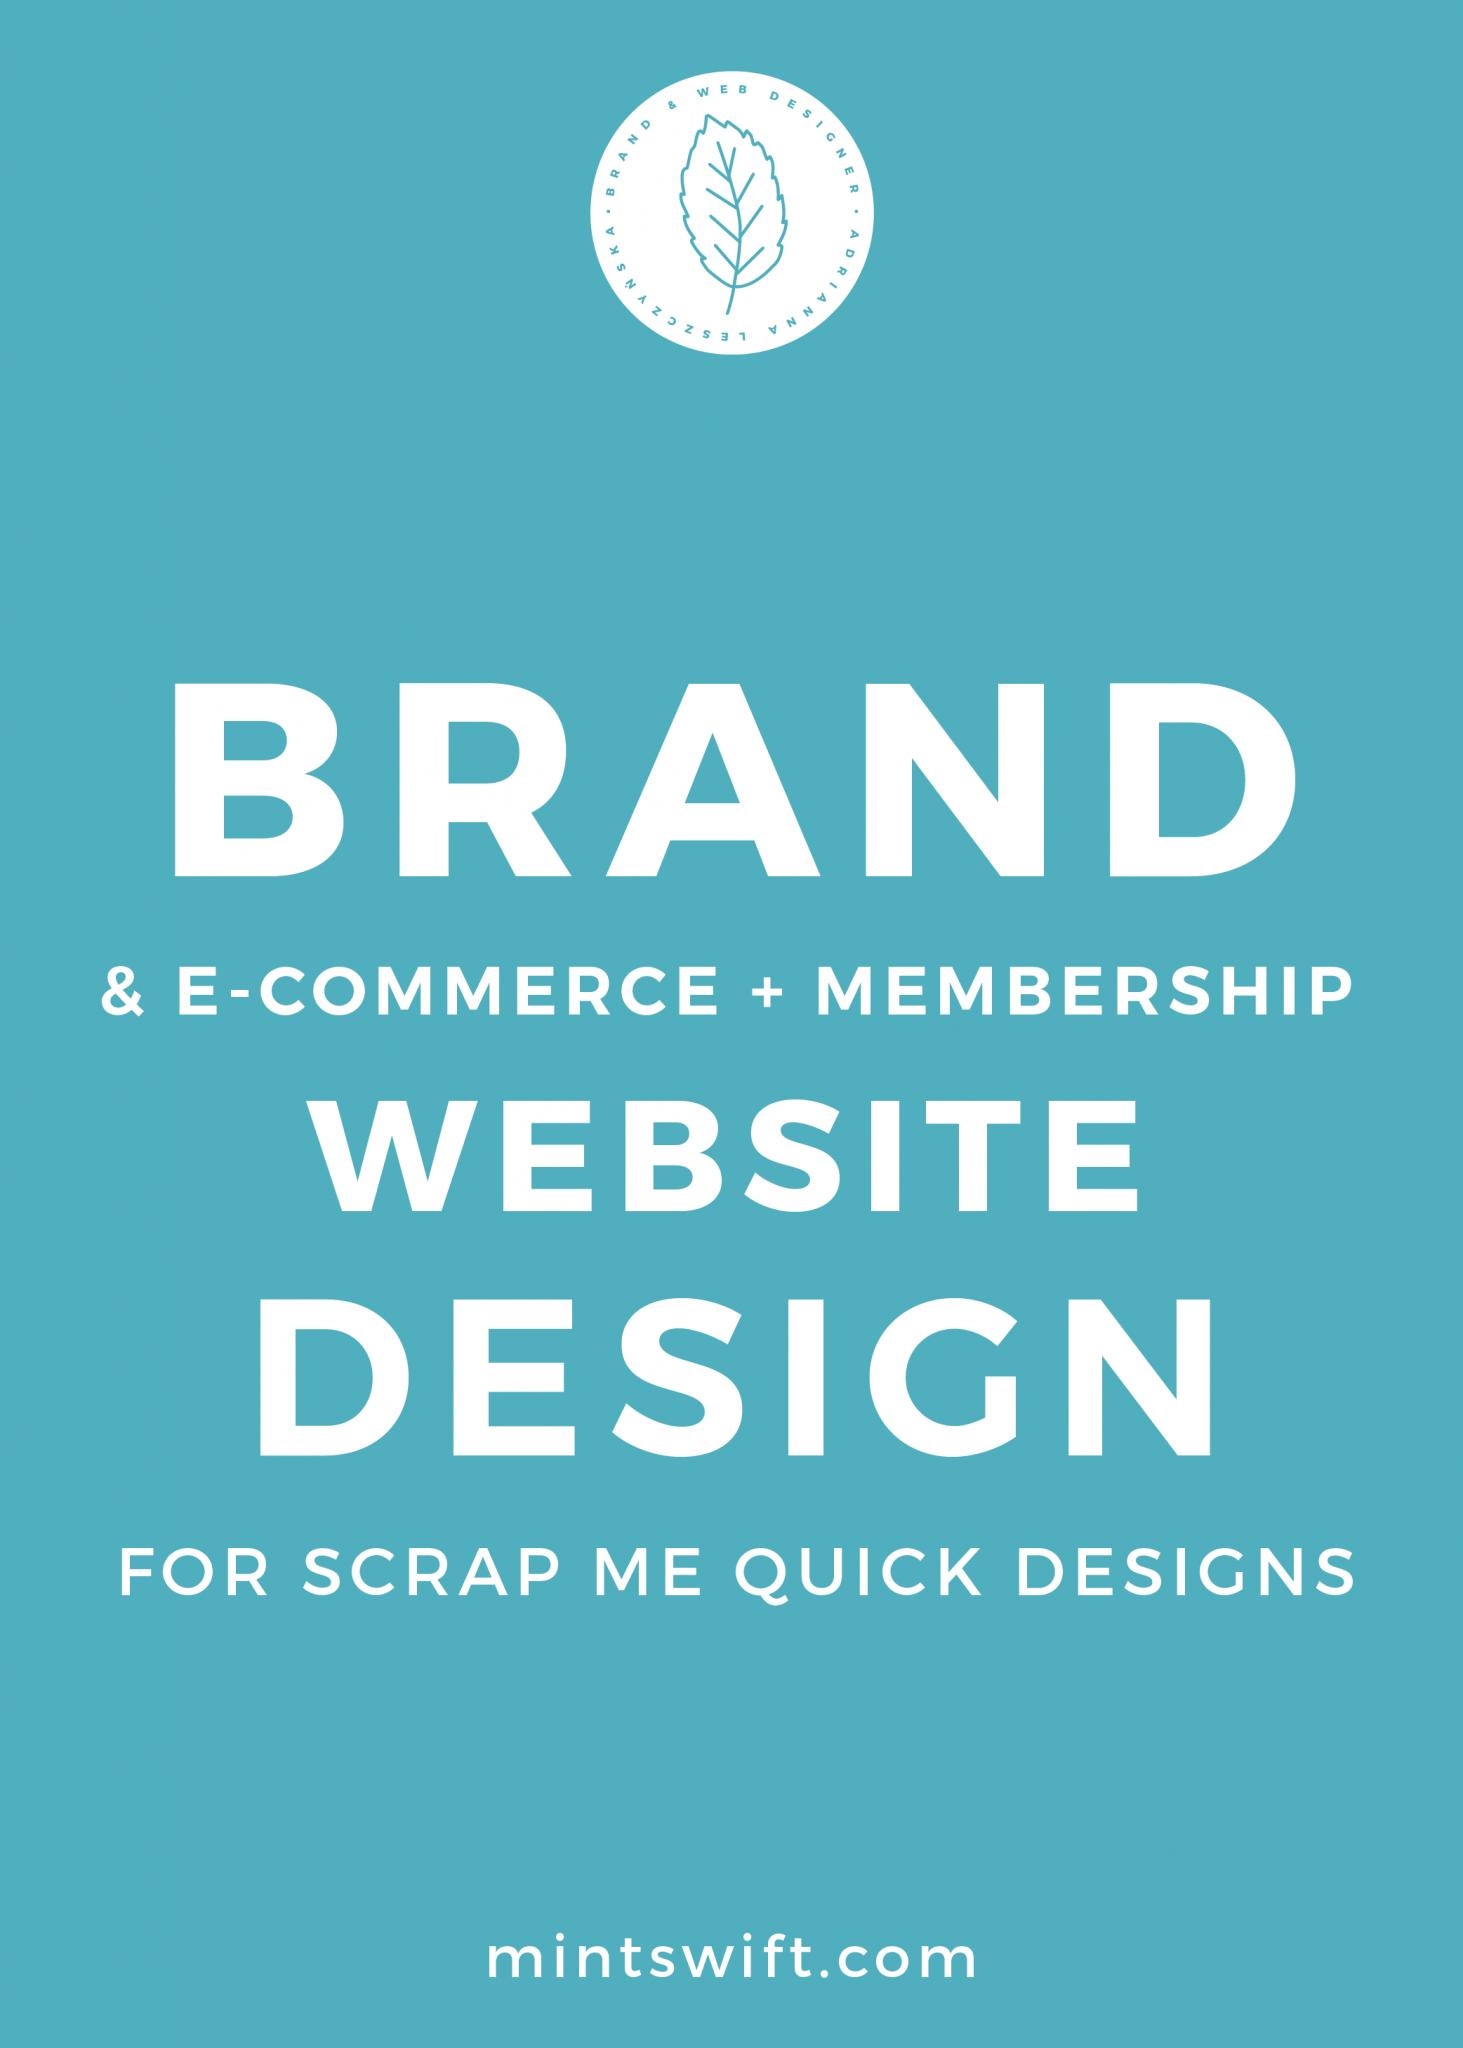 Brand & E-commerce & Membership Website Design for Scrap Me Quick Designs - MintSwift